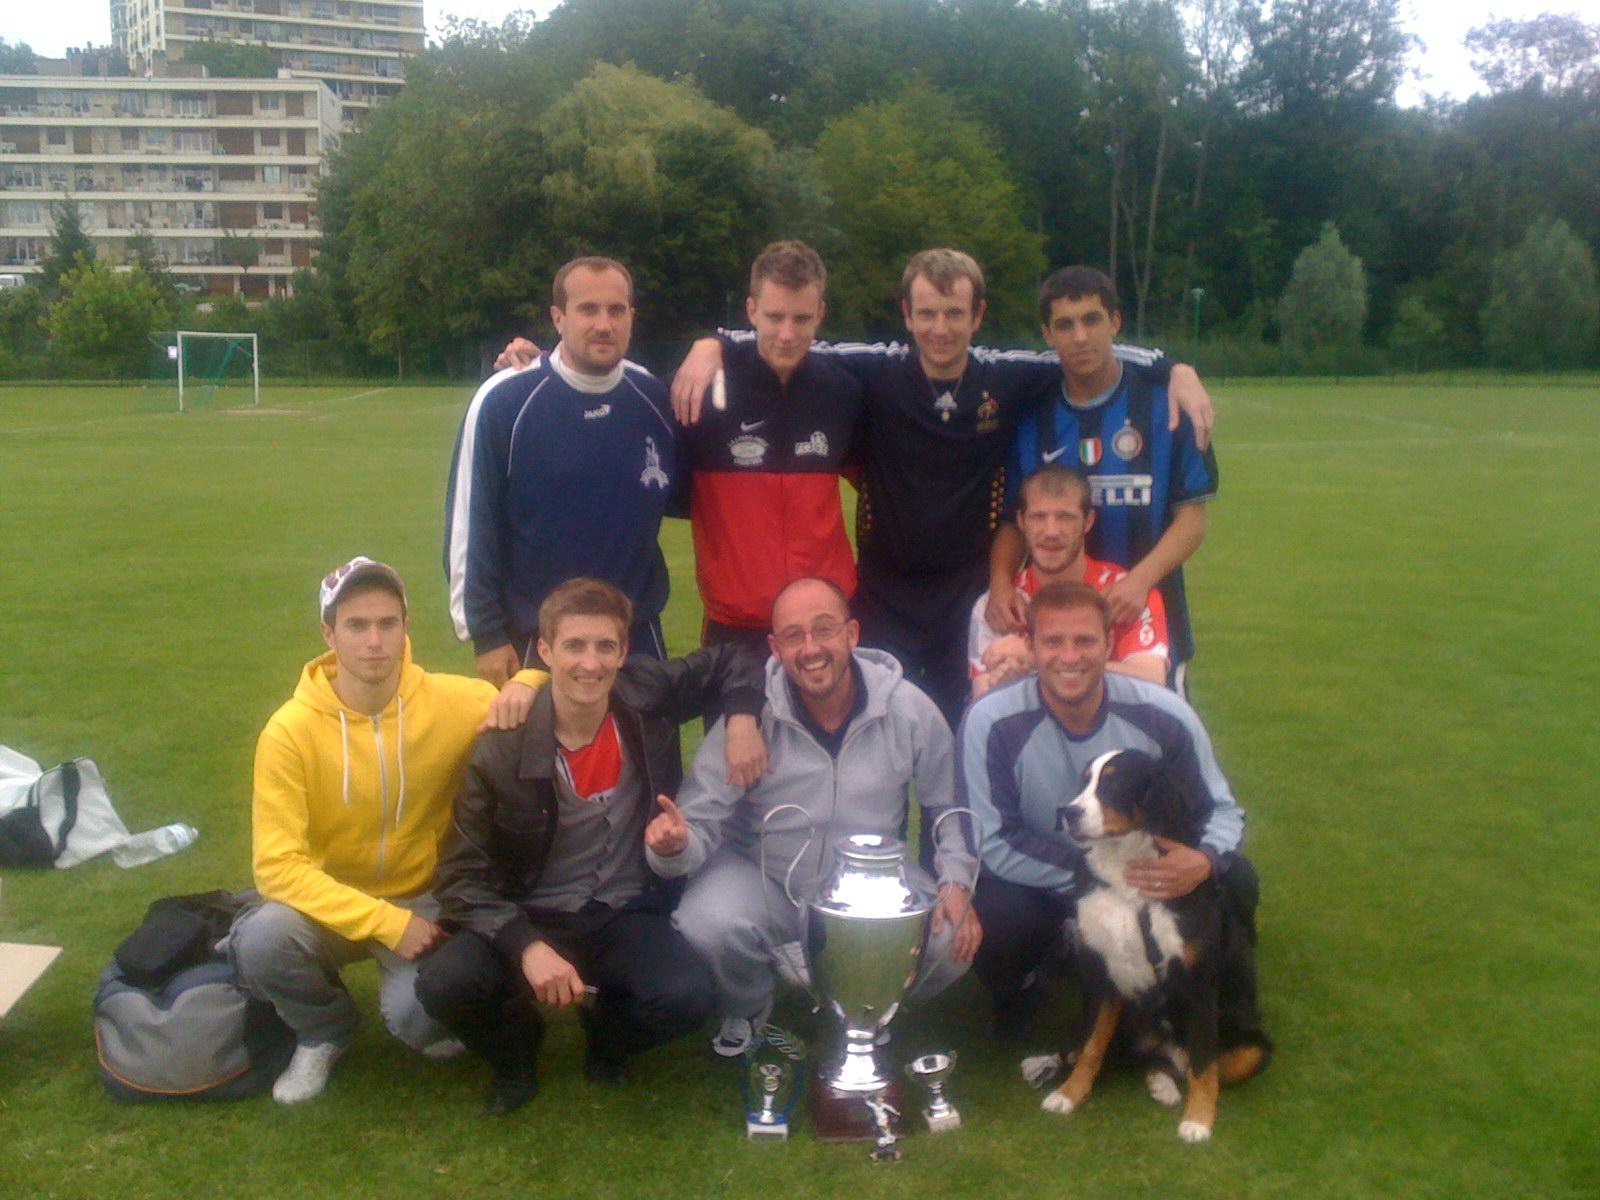 Vainqueur tournoi CAN 2010